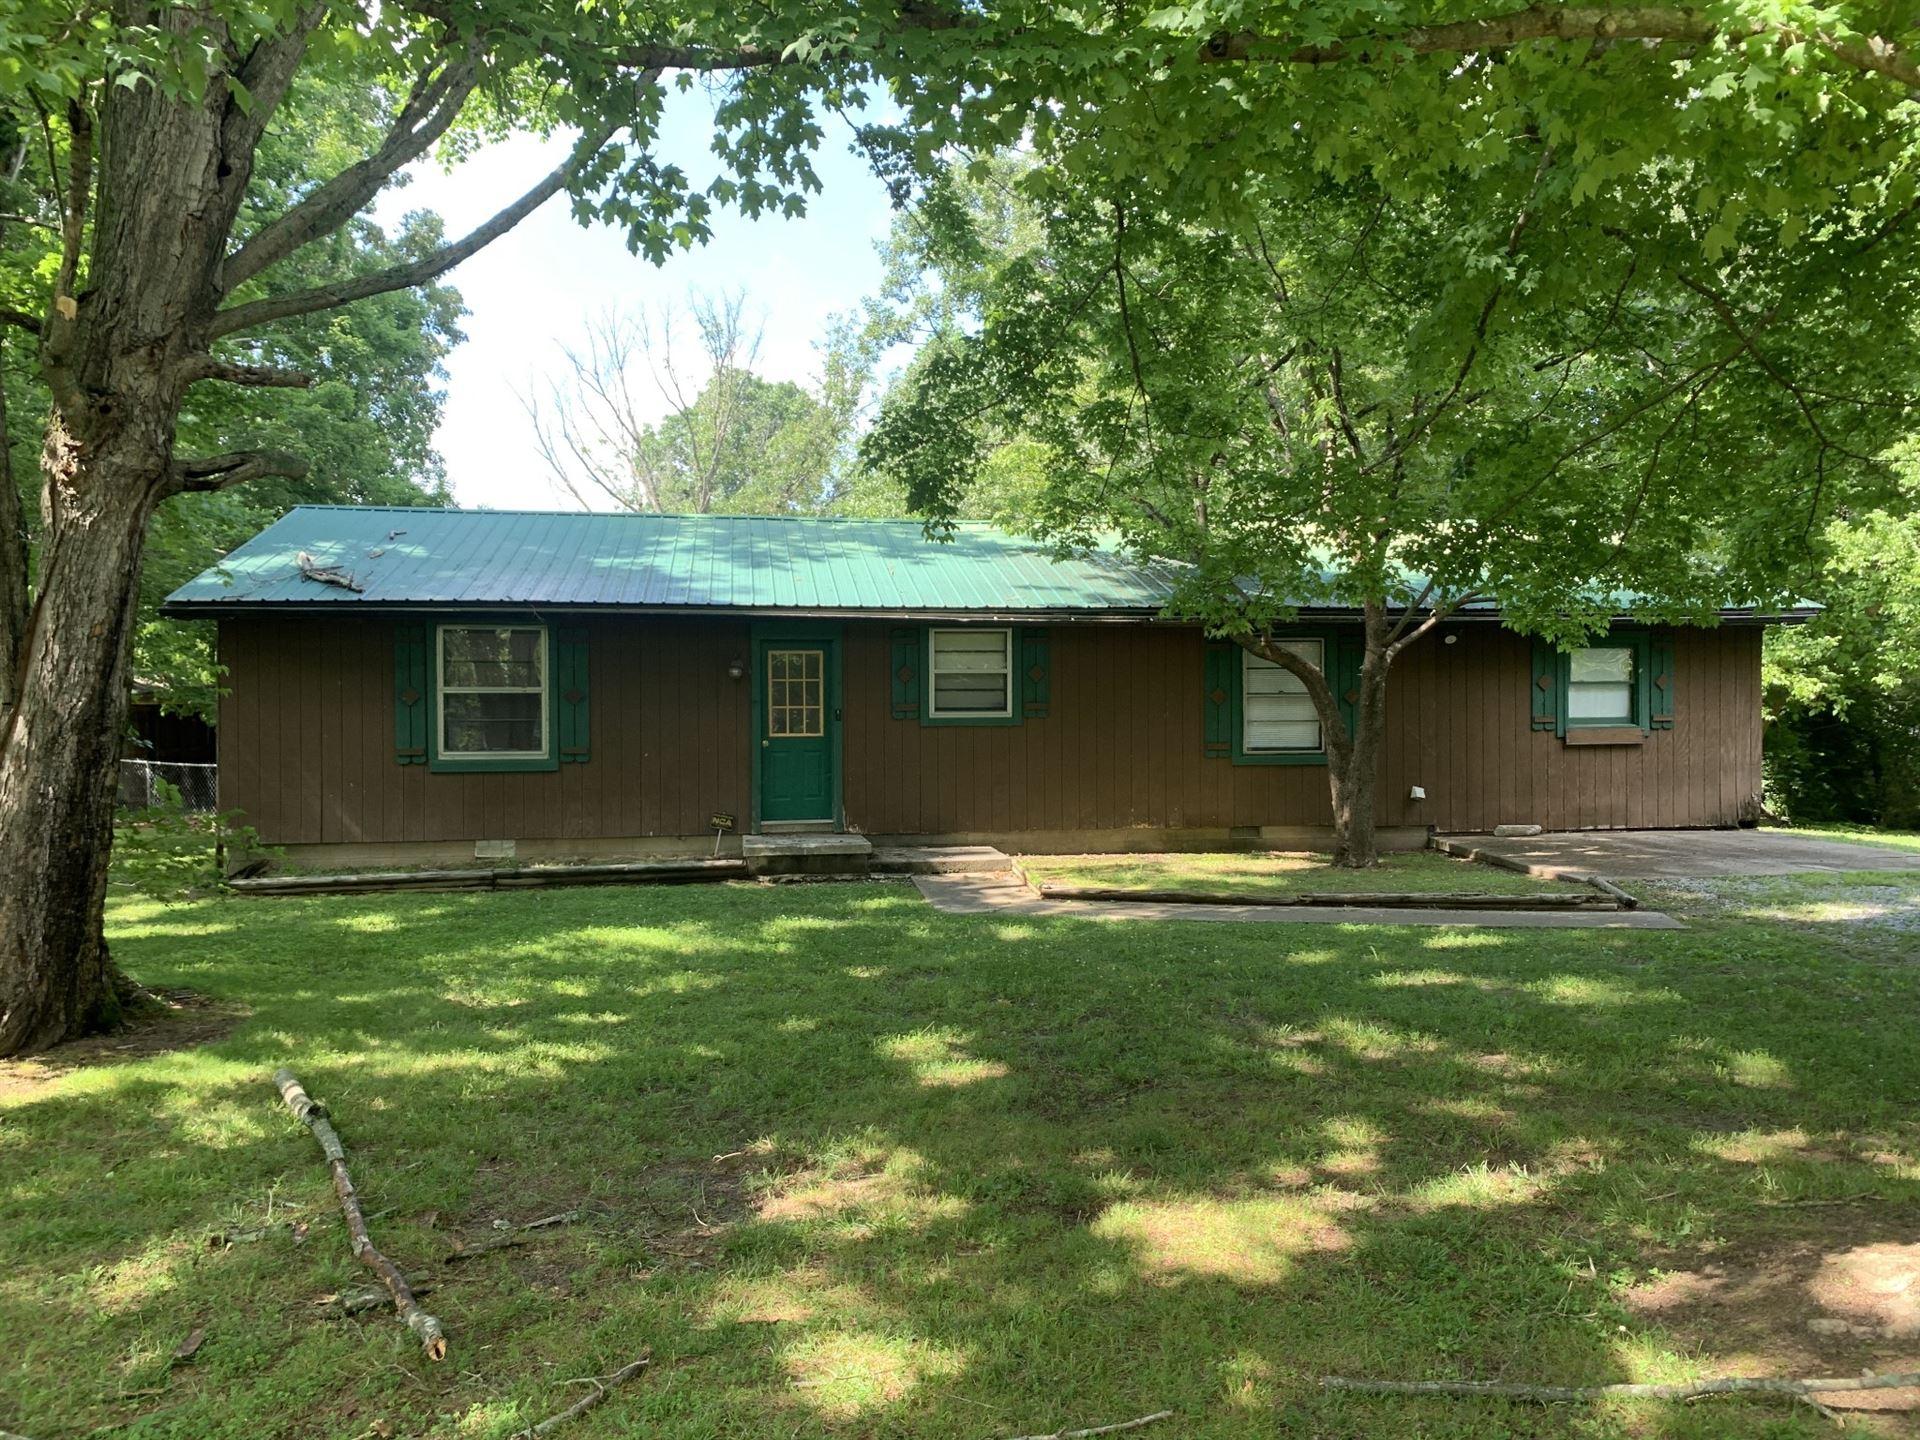 1205 Johnson St, Burns, TN 37029 - MLS#: 2262273